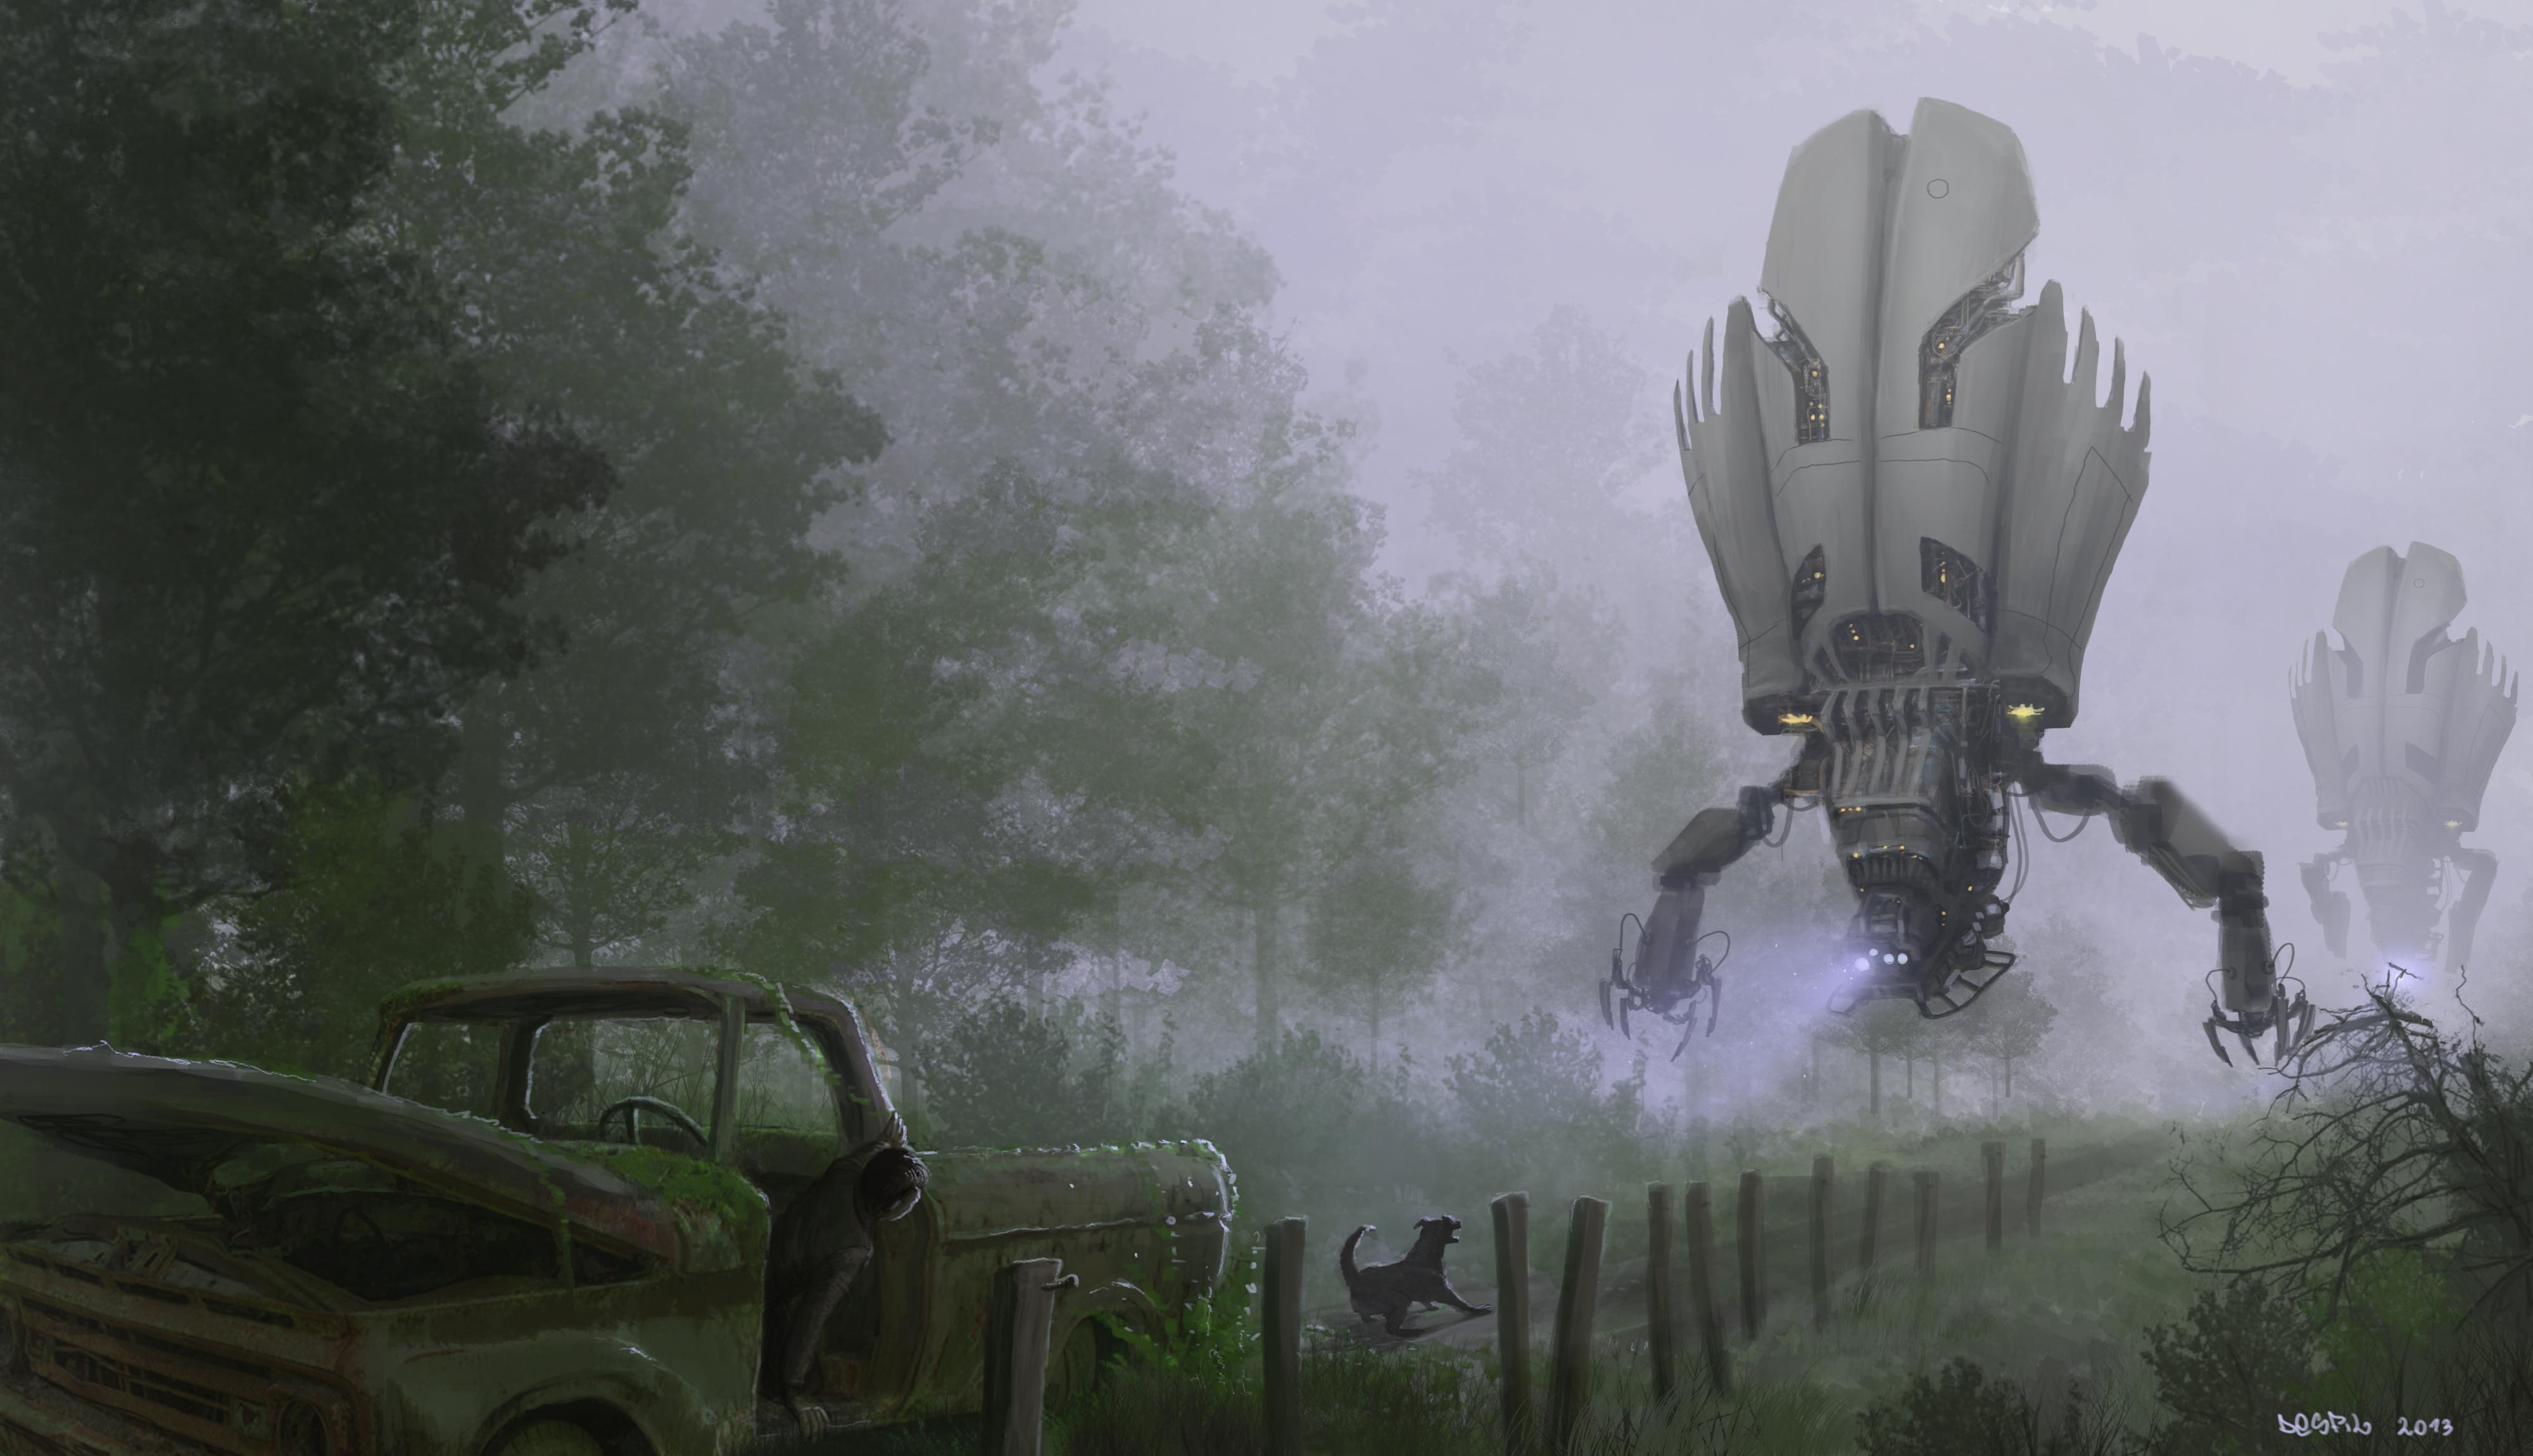 General 4000x2300 artwork robot dog car science fiction apocalyptic digital art